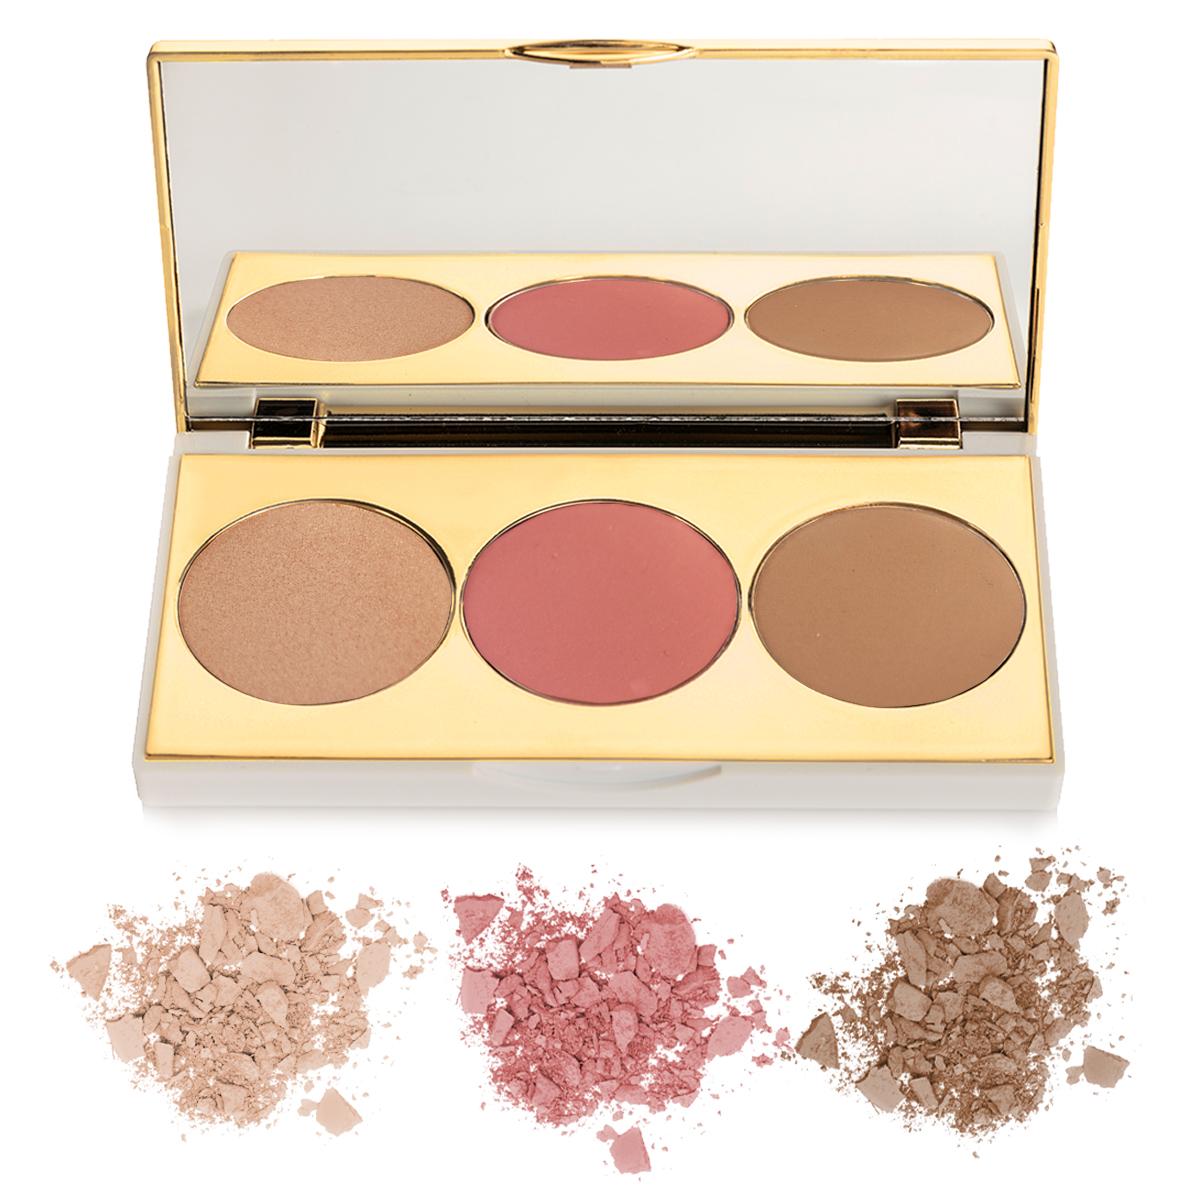 3 in 1 highlighter + blush + bronzer - Game Face